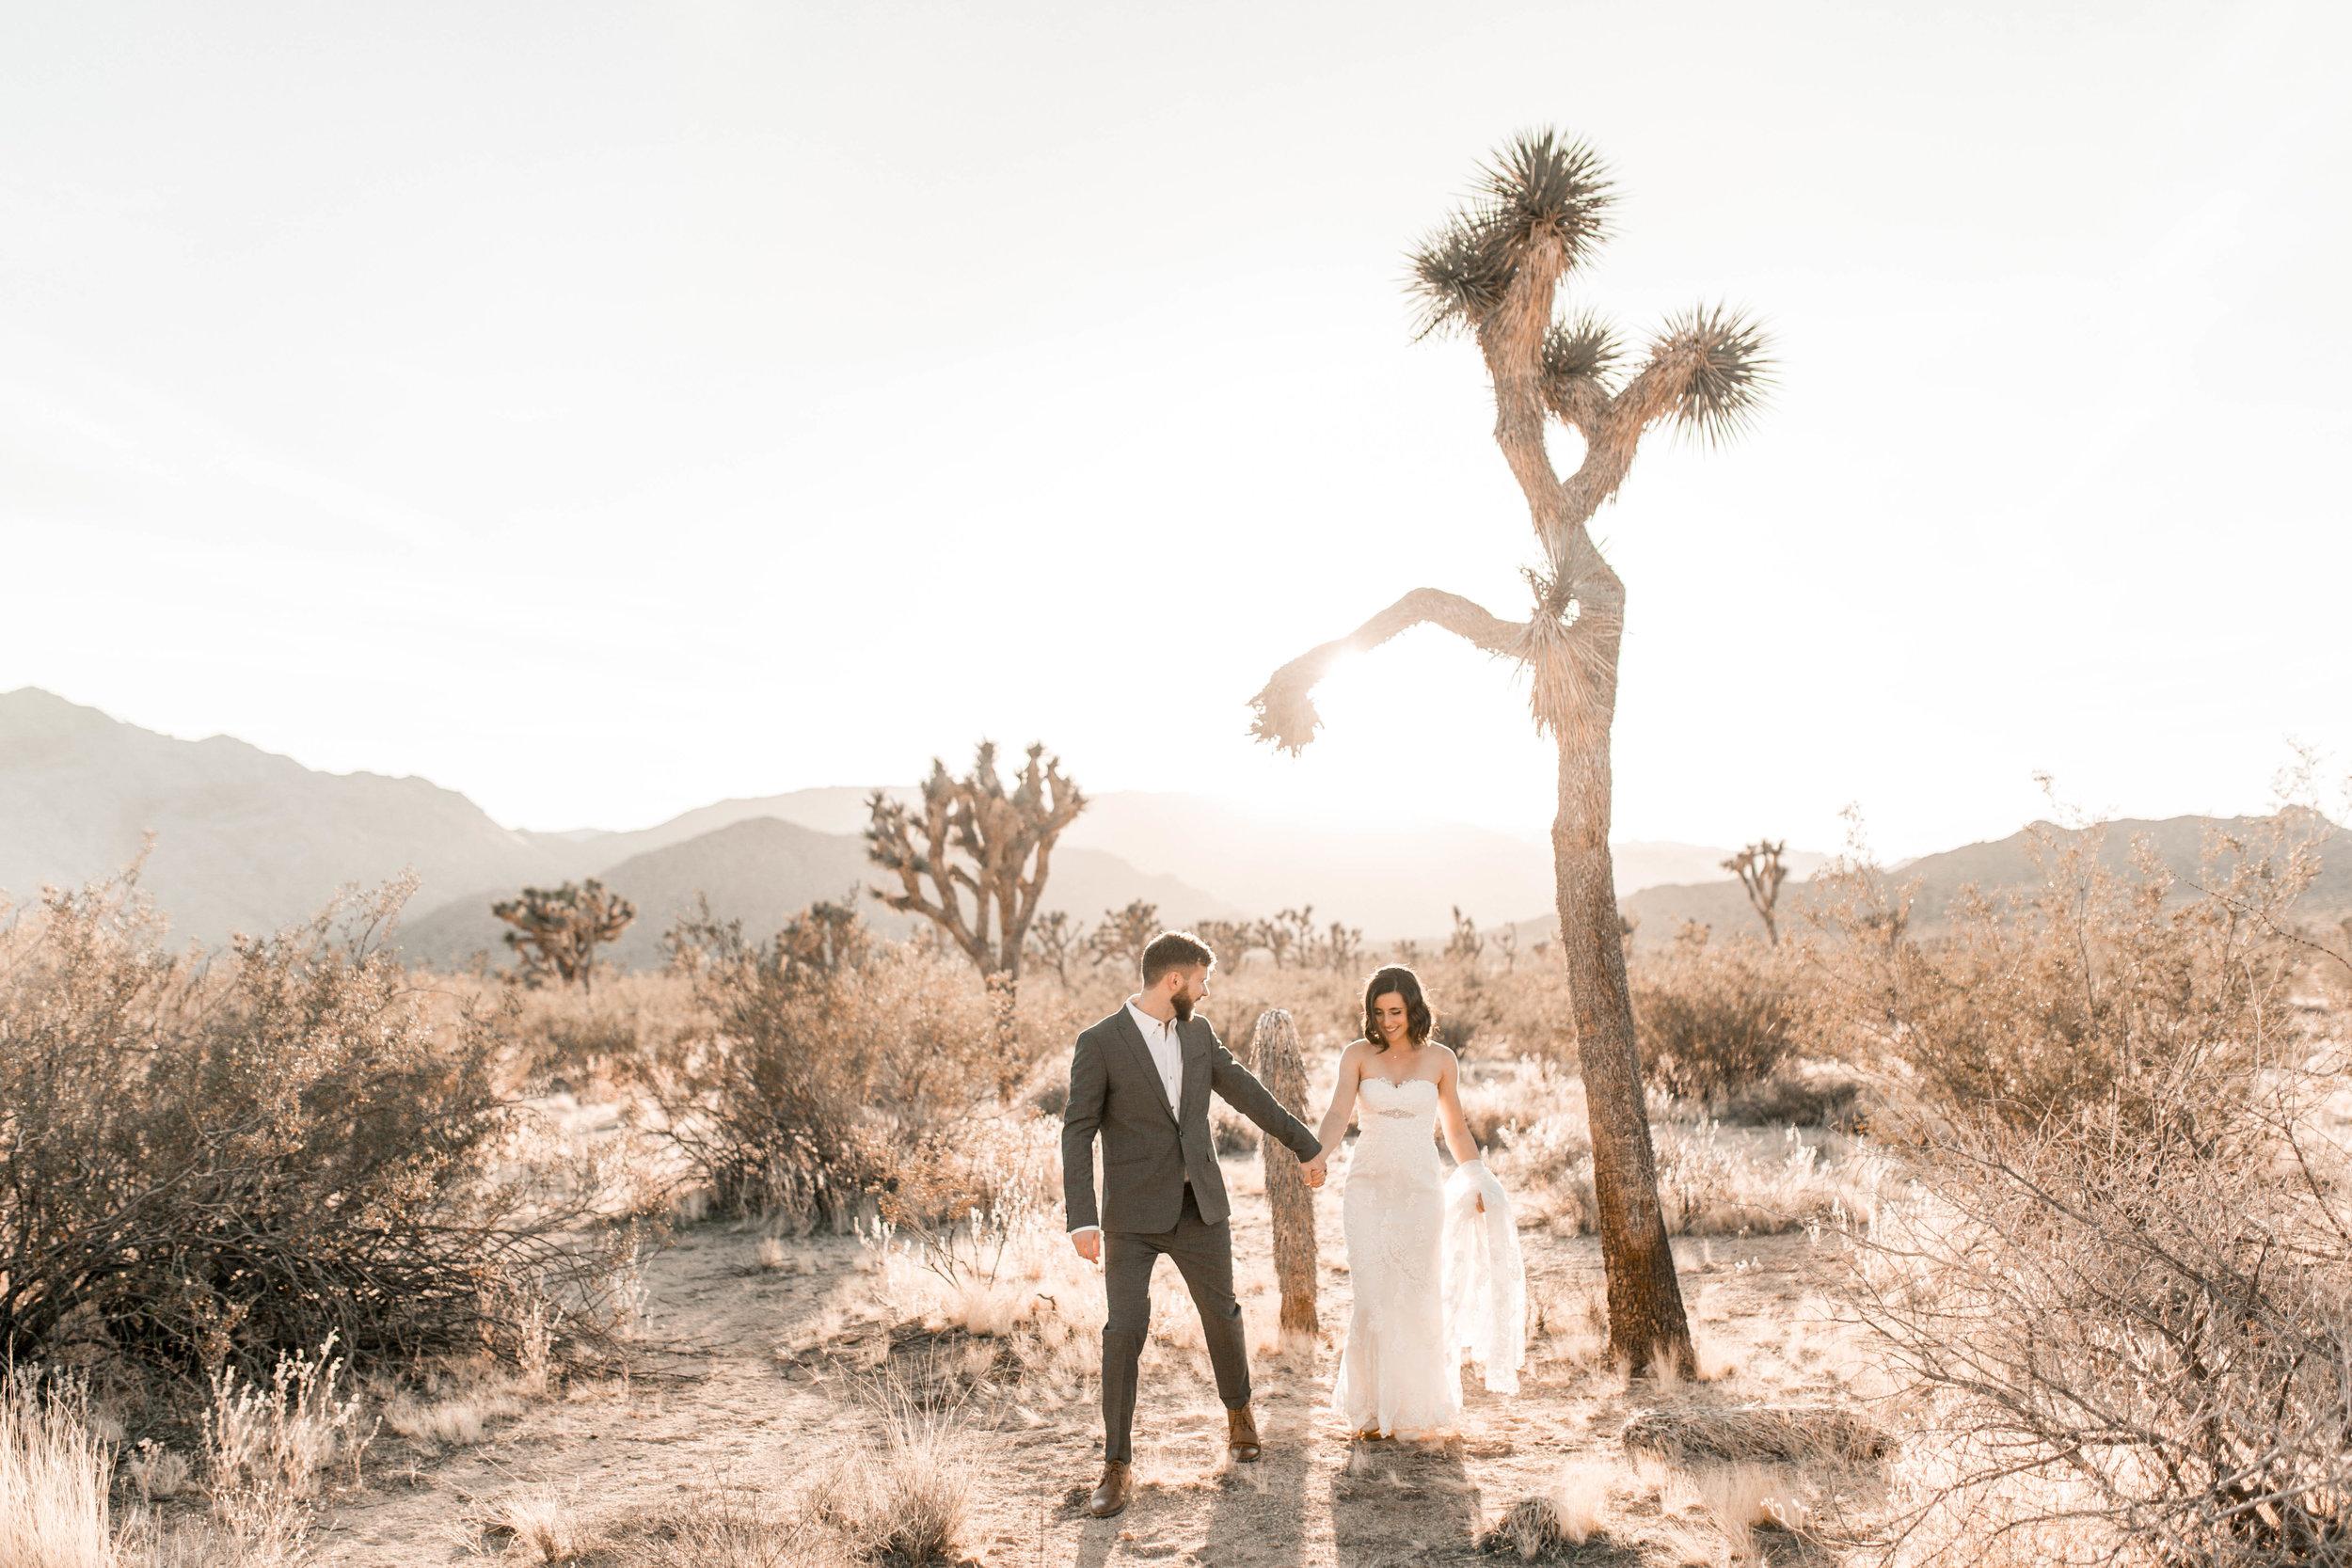 nicole-daacke-photography-joshua-tree-adventurous-elopement-wedding-national-park-wedding-photographer-adventure-wedding-adventurous-elopement-jtree-joshua-tree-national-park-wedding-photographer-intimate-weddings-golden-desert-love-14.jpg